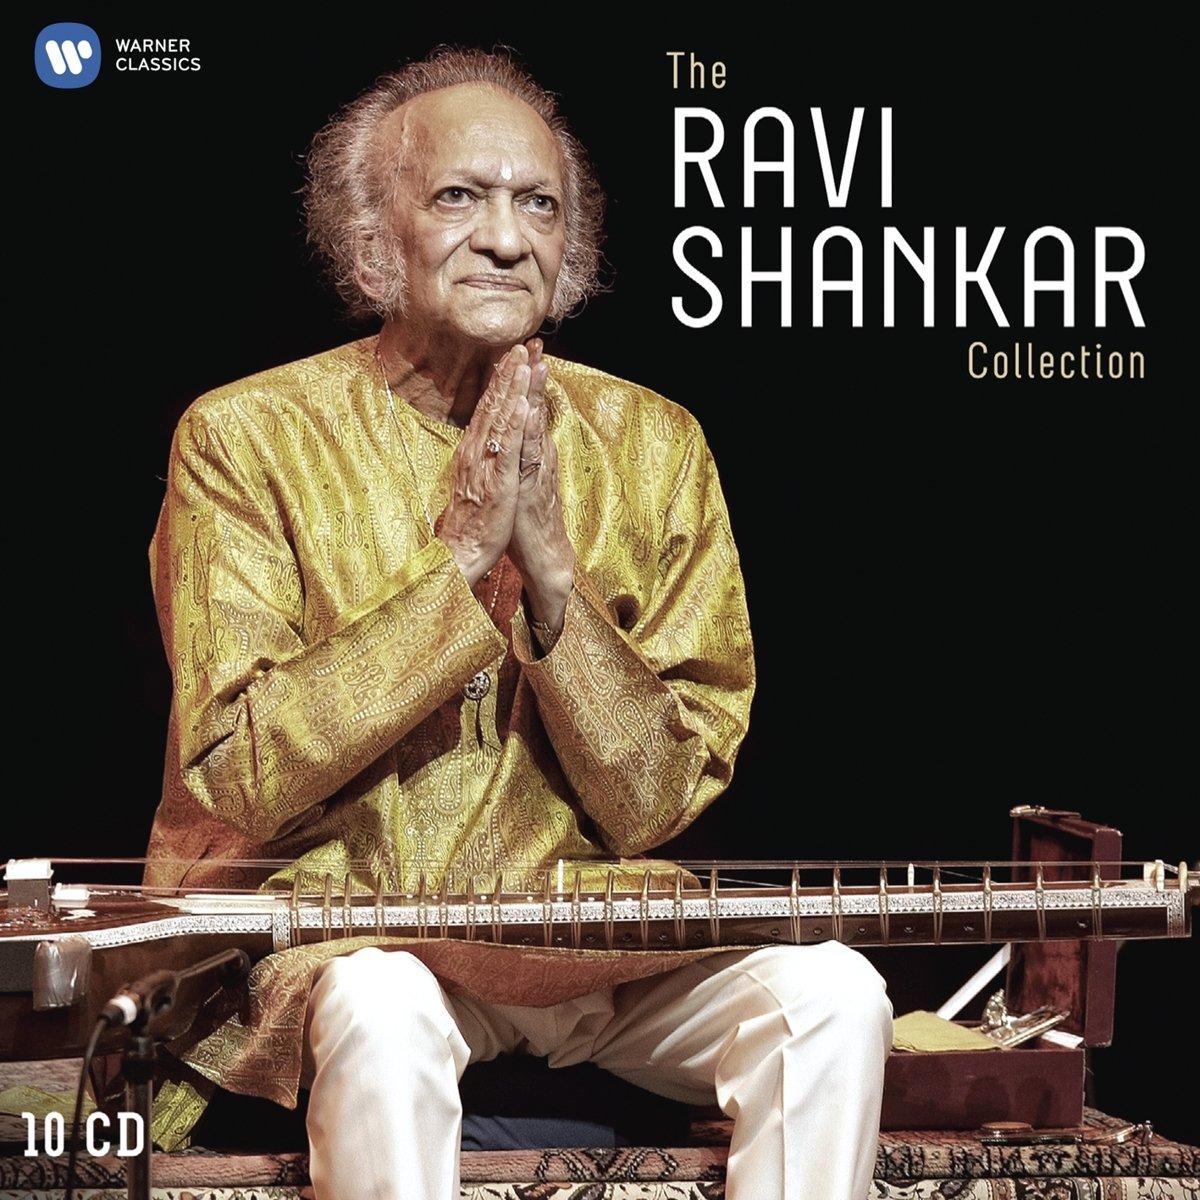 Ravi Shankar Collection by Warner Classics